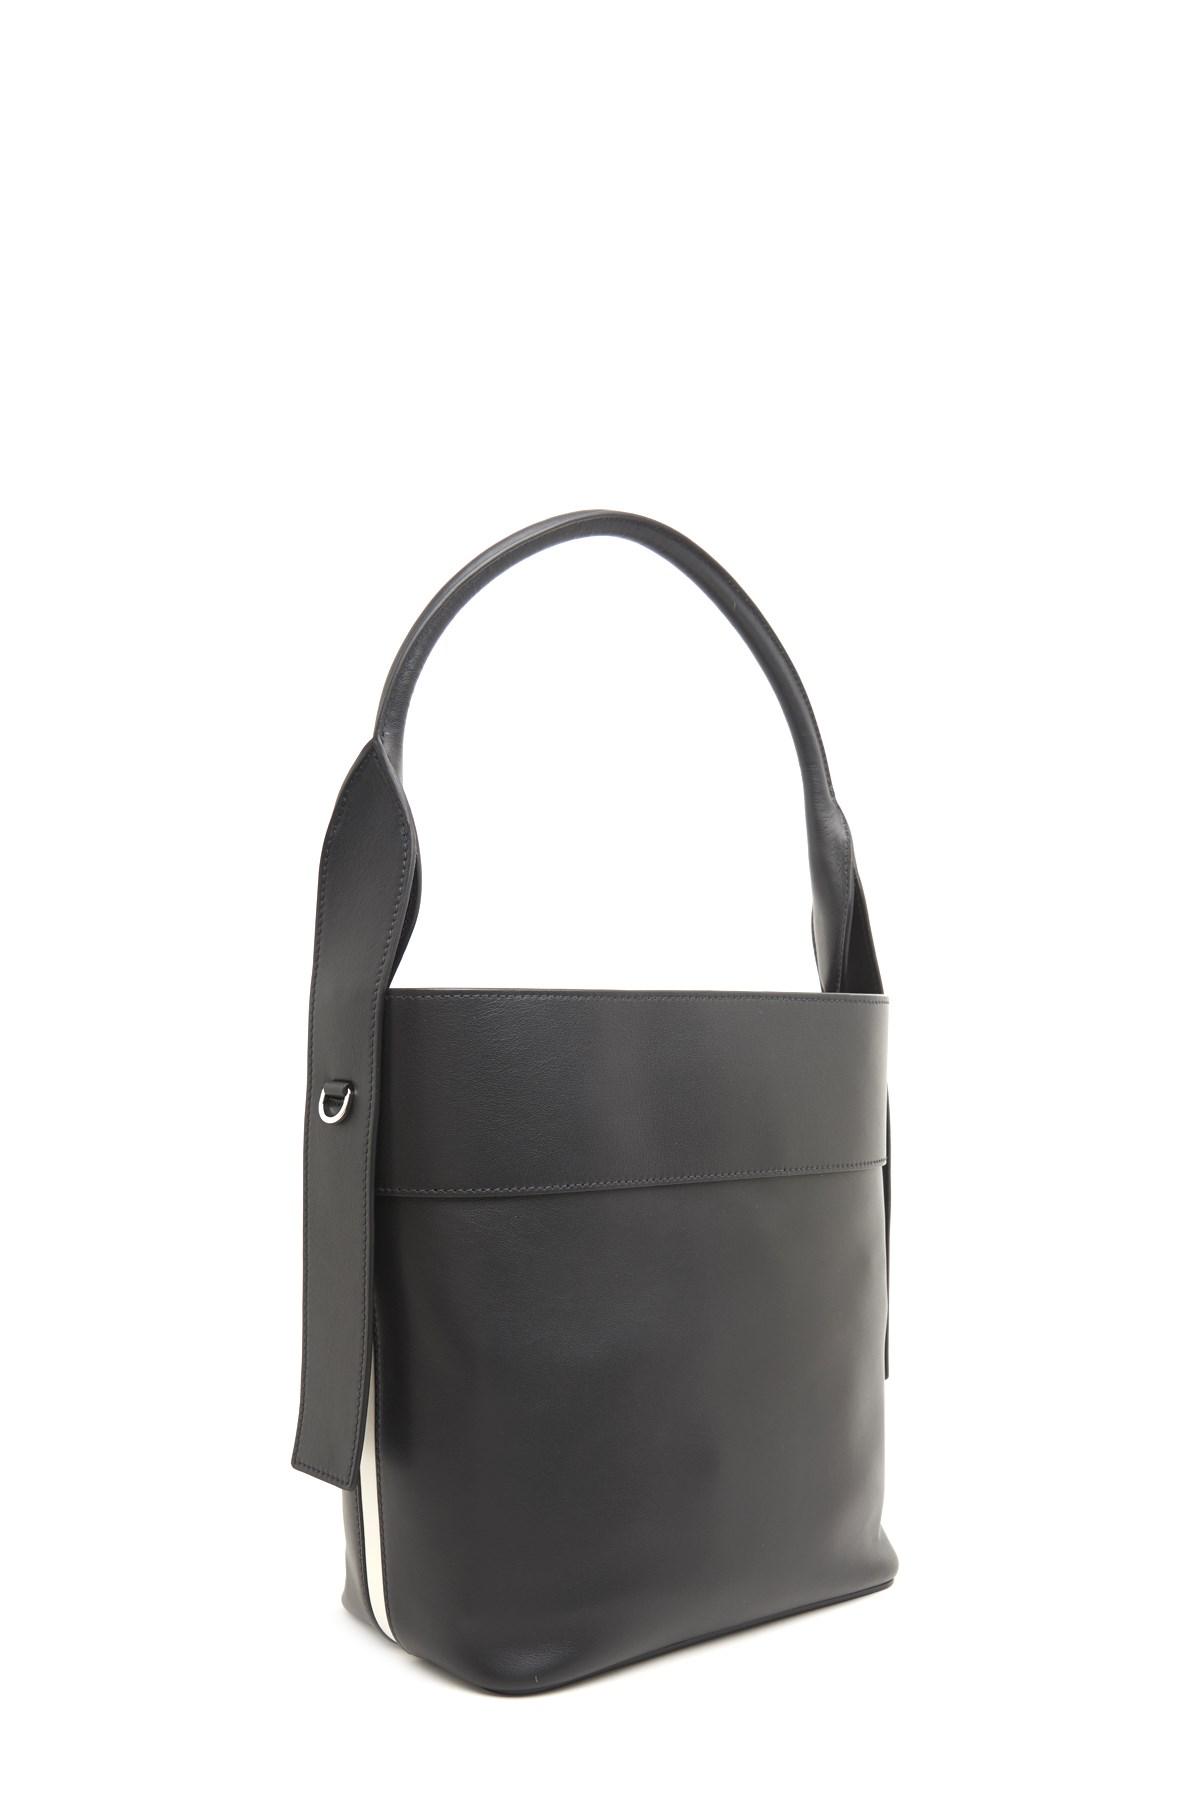 54706aa1f1 prada 'Overture' bucket bag available on julian-fashion.com - 63656